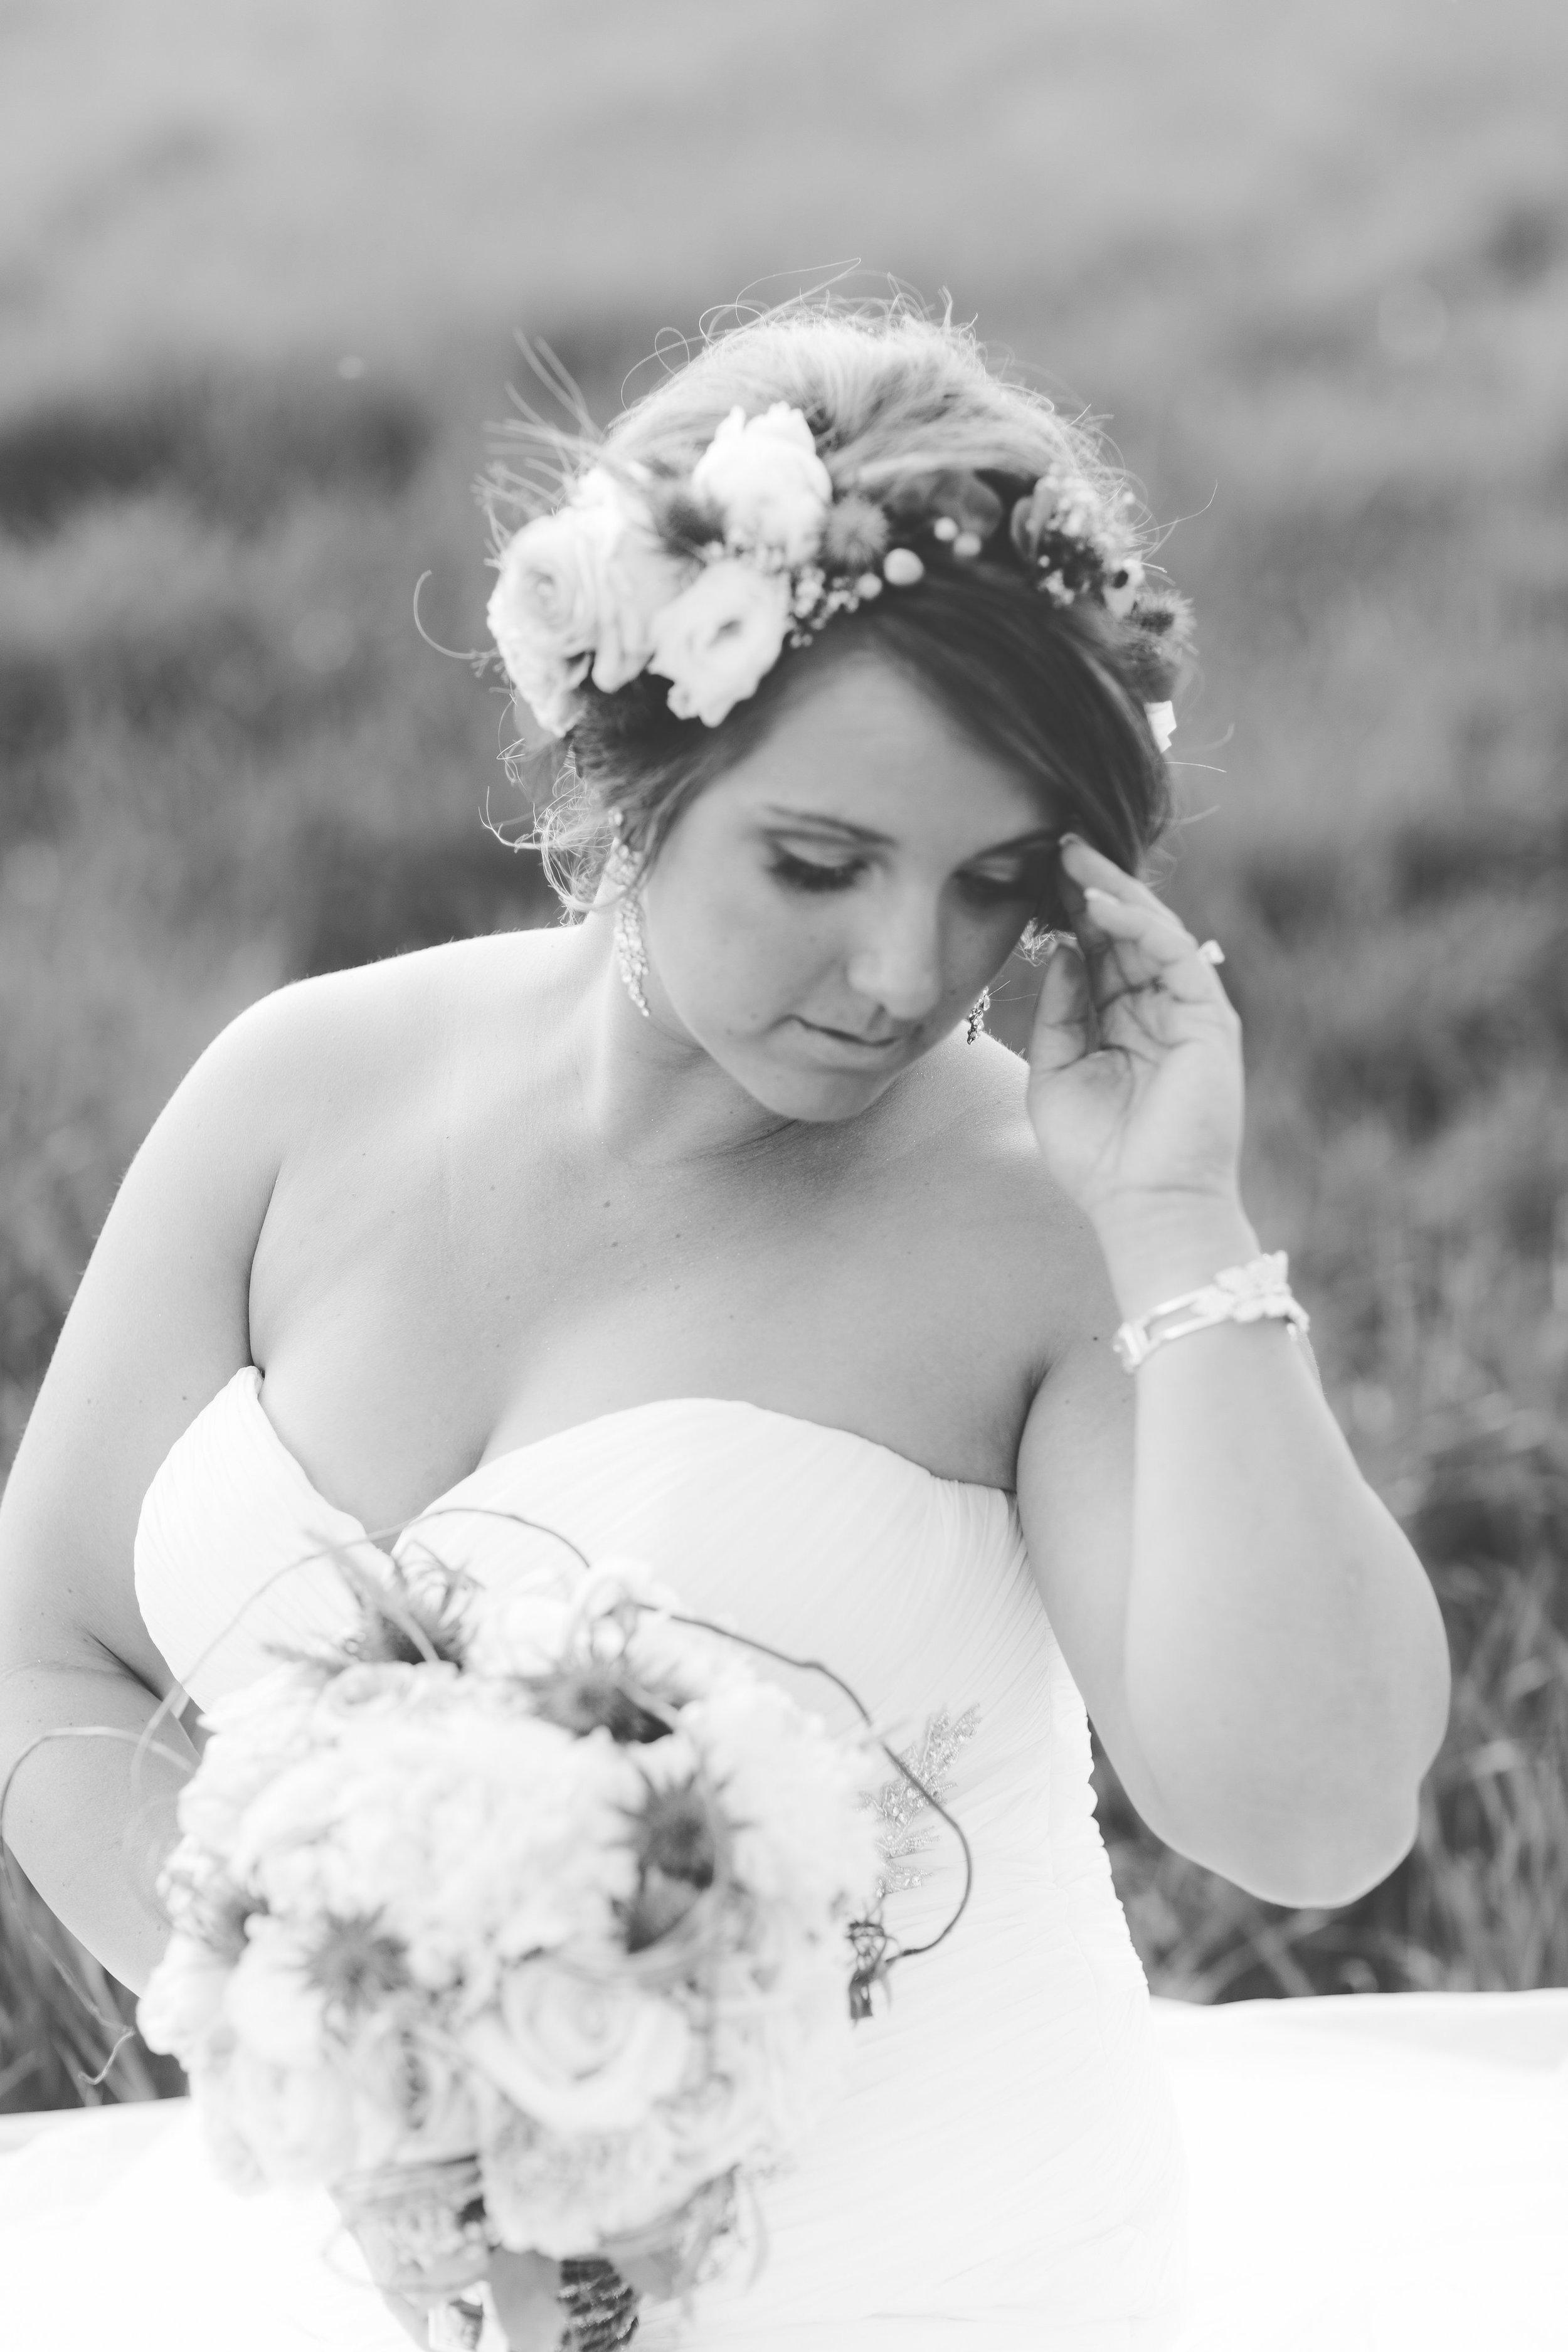 Me on my wedding! Photo taken by the amazing Meg Courtney!